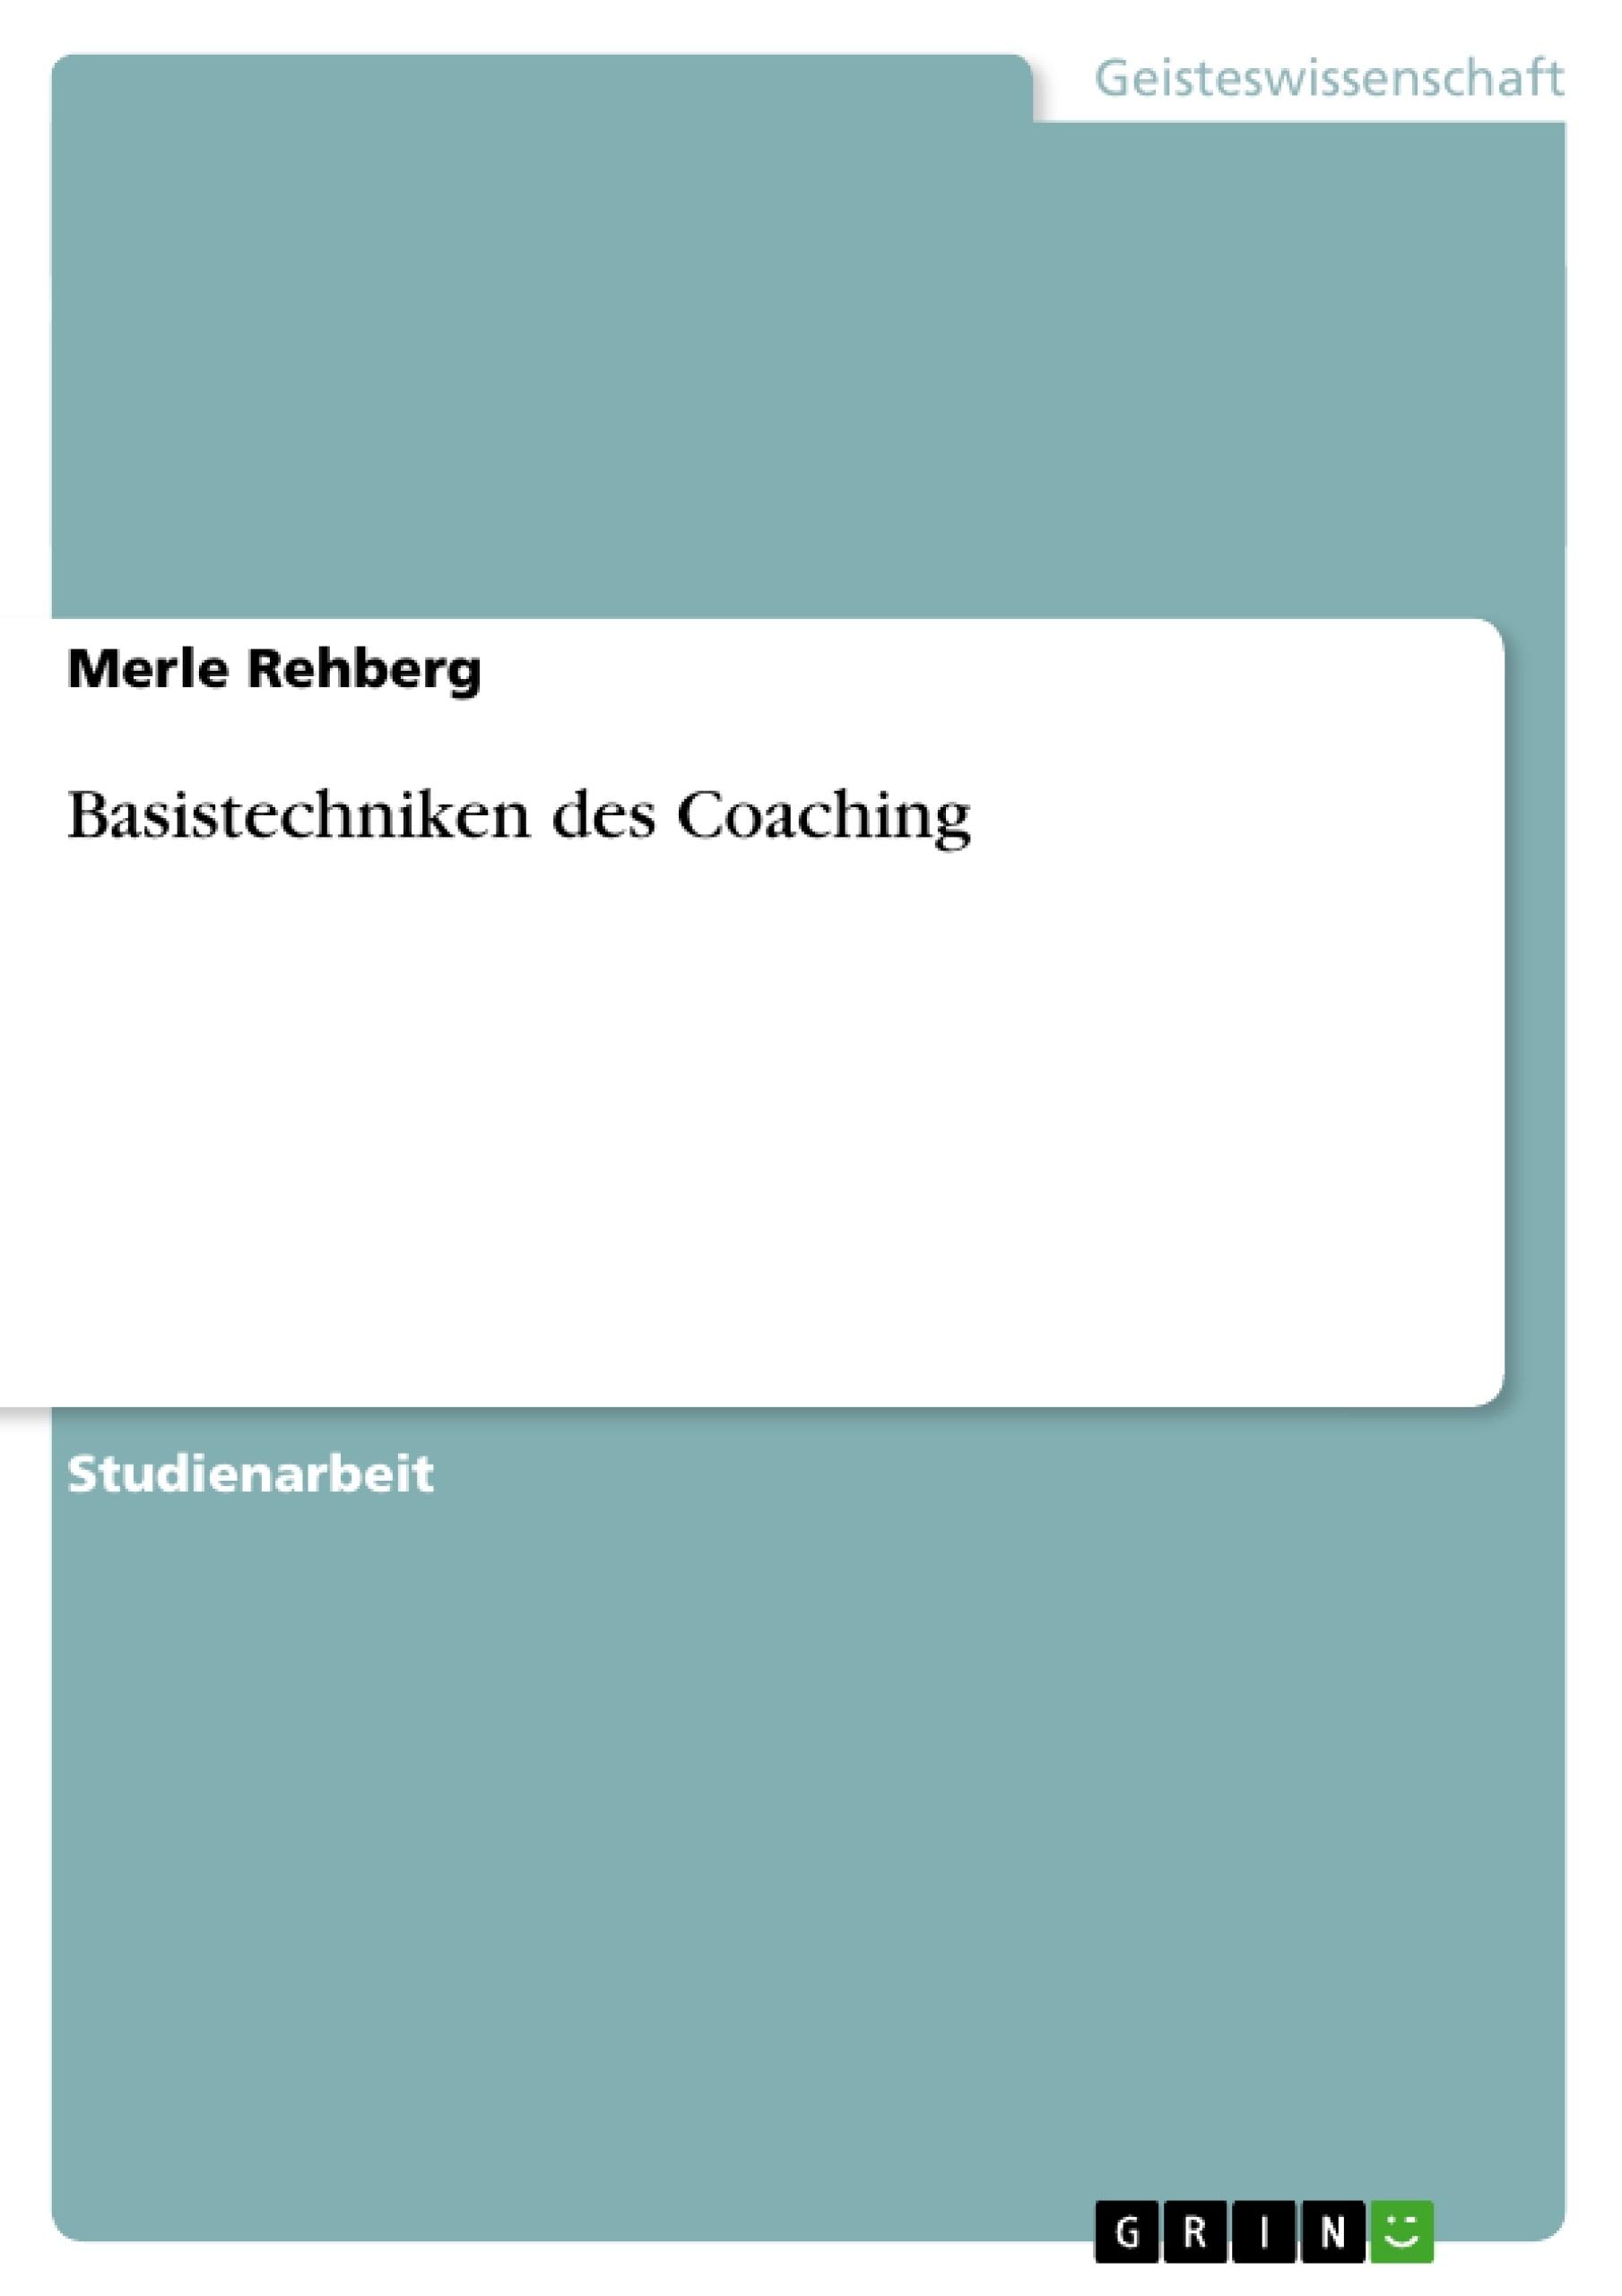 Titel: Basistechniken des Coaching